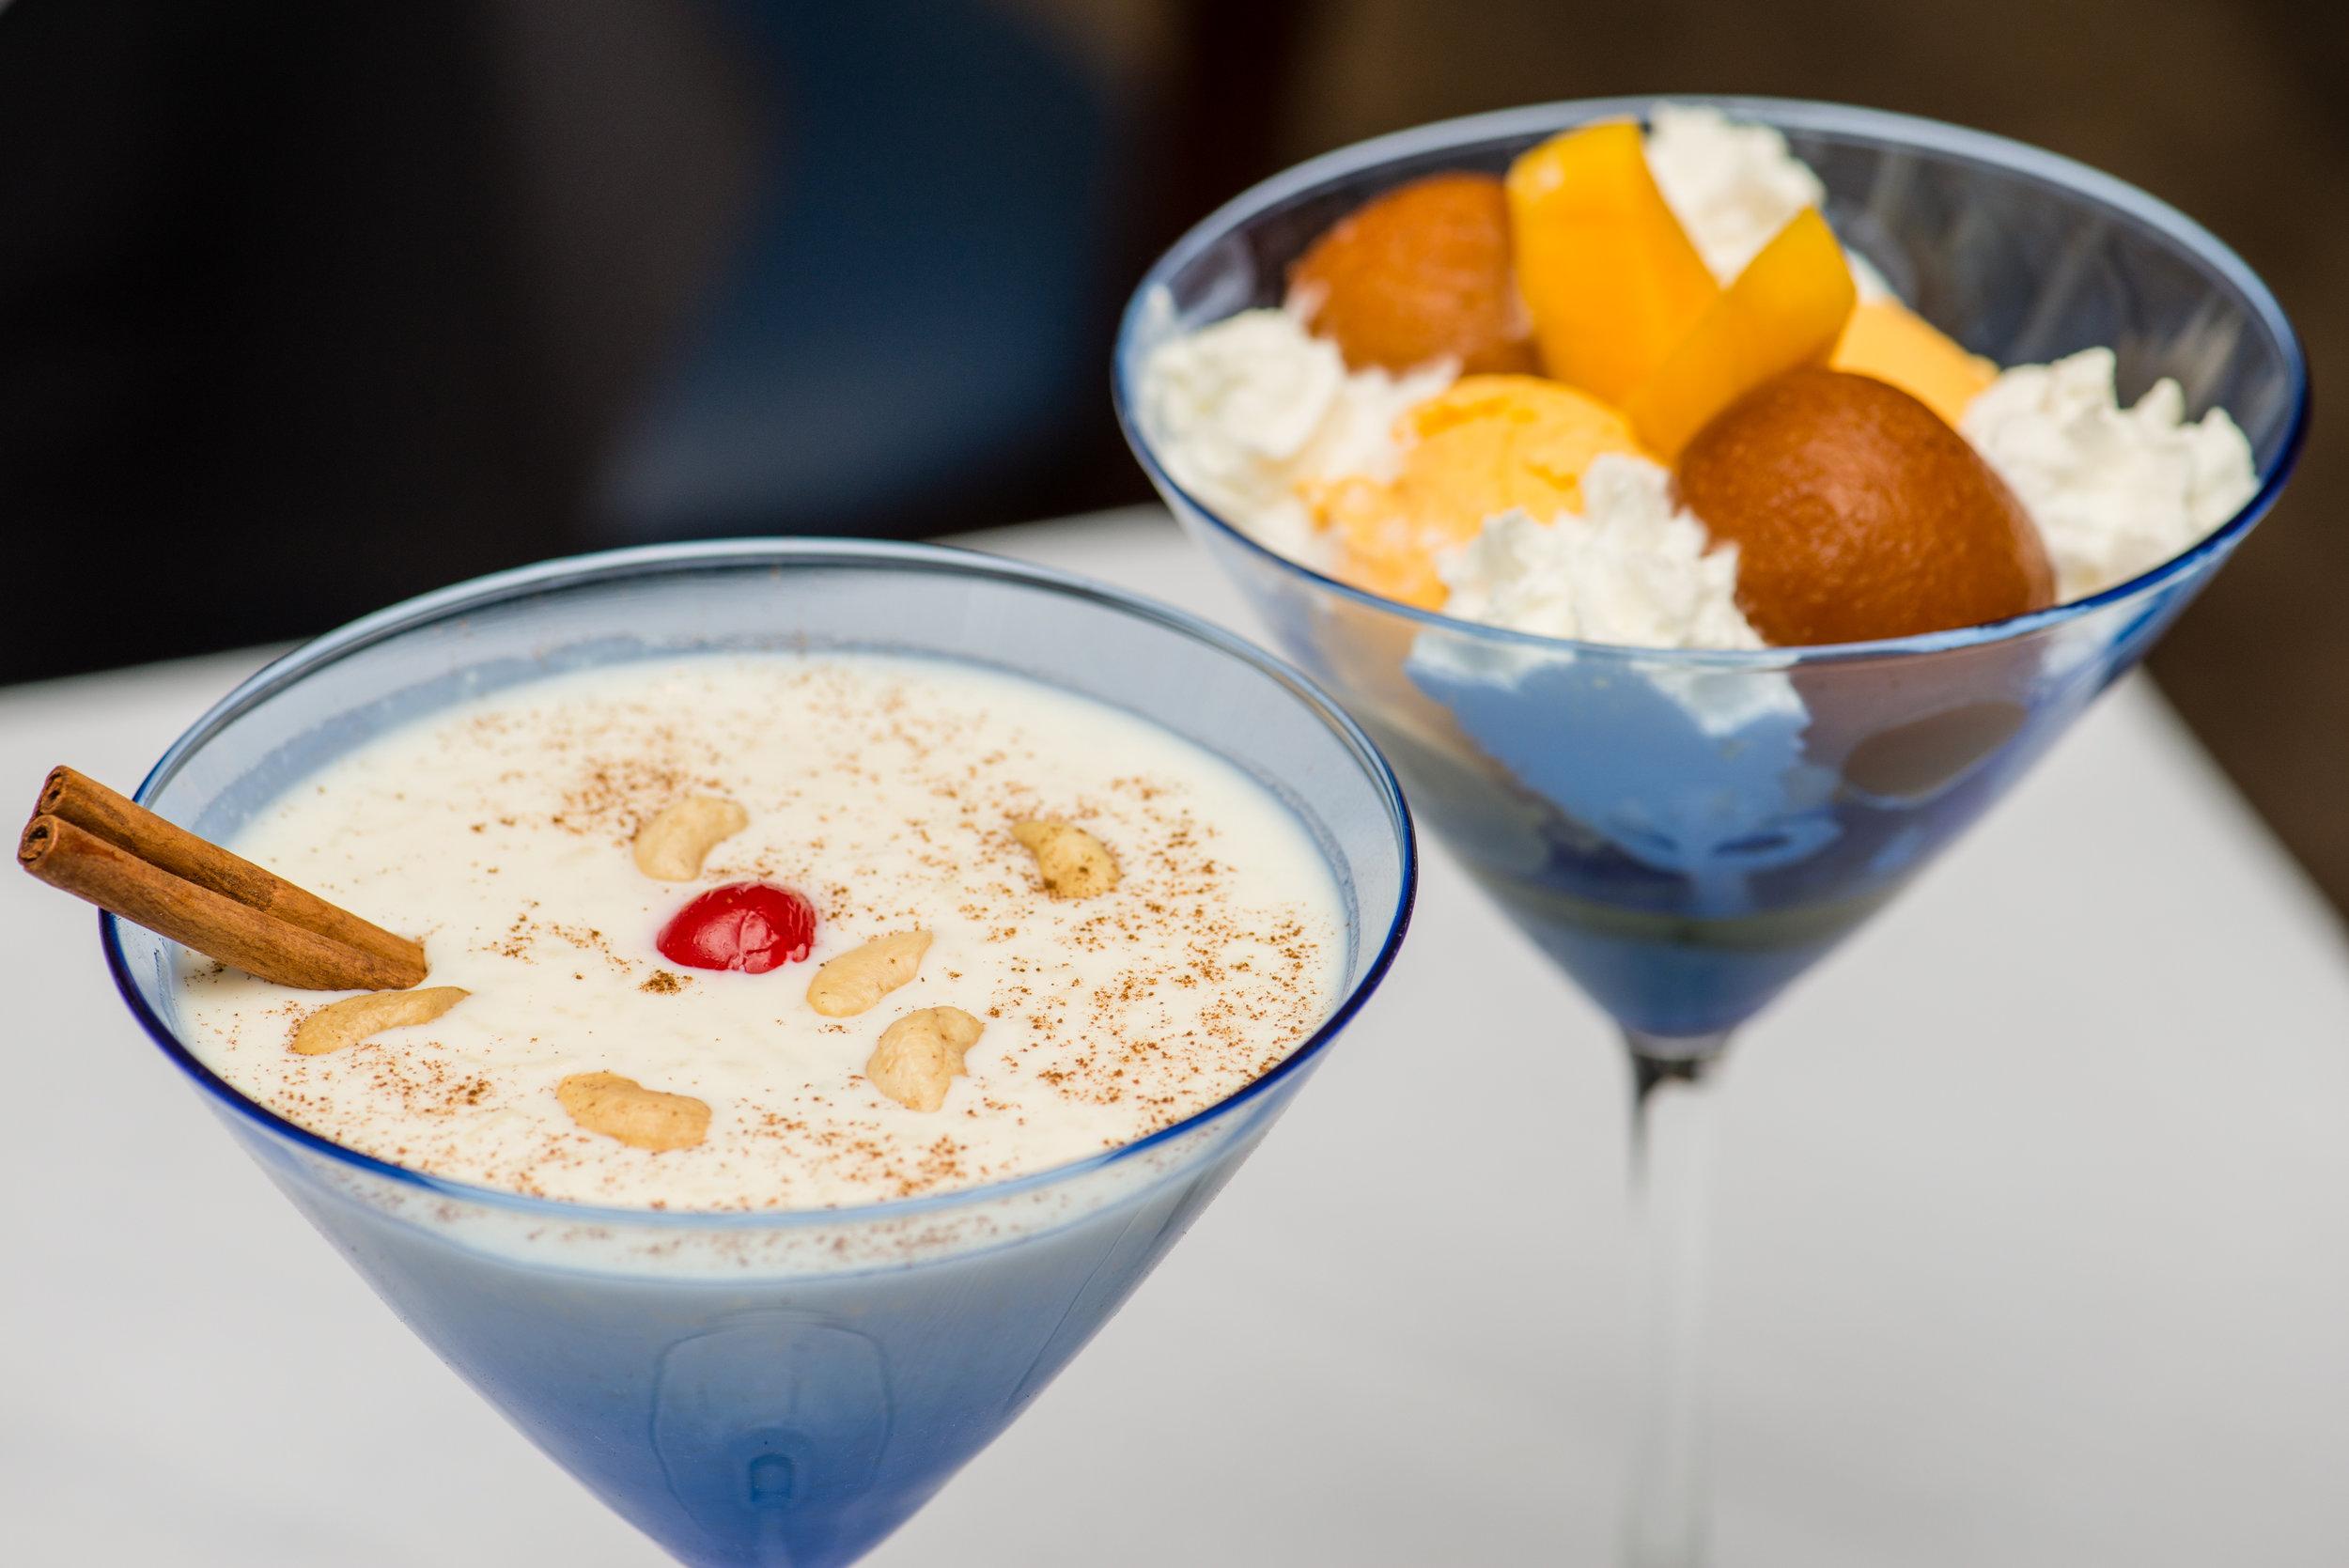 Rice Pudding (Kheer) and Mango Ice Cream with Gulab Jamun